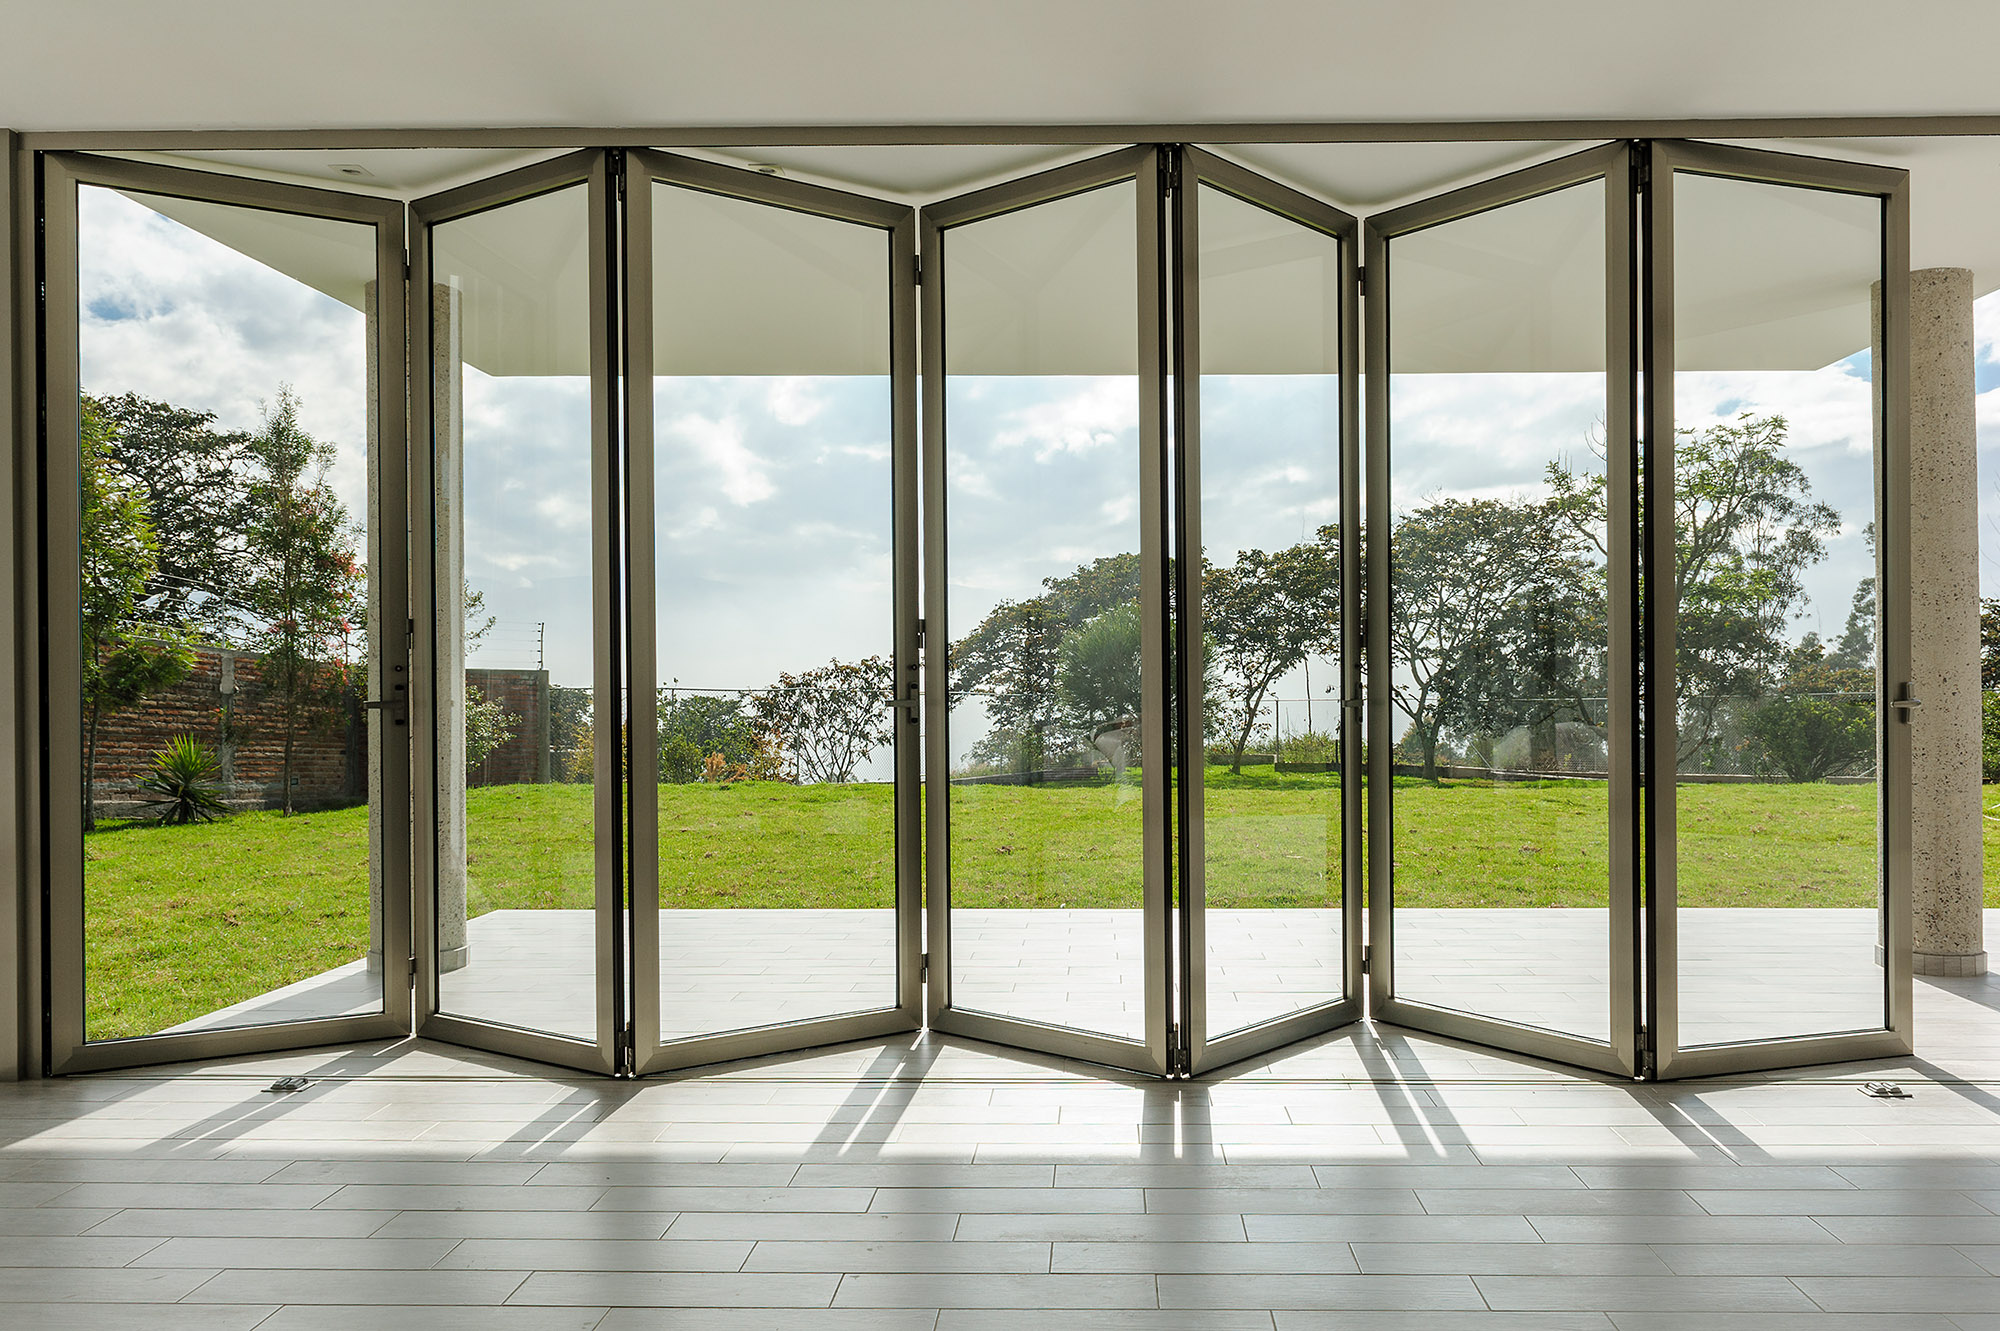 Puerta plegable de vidrio en casa, con vista panorámica de paisaje exterior